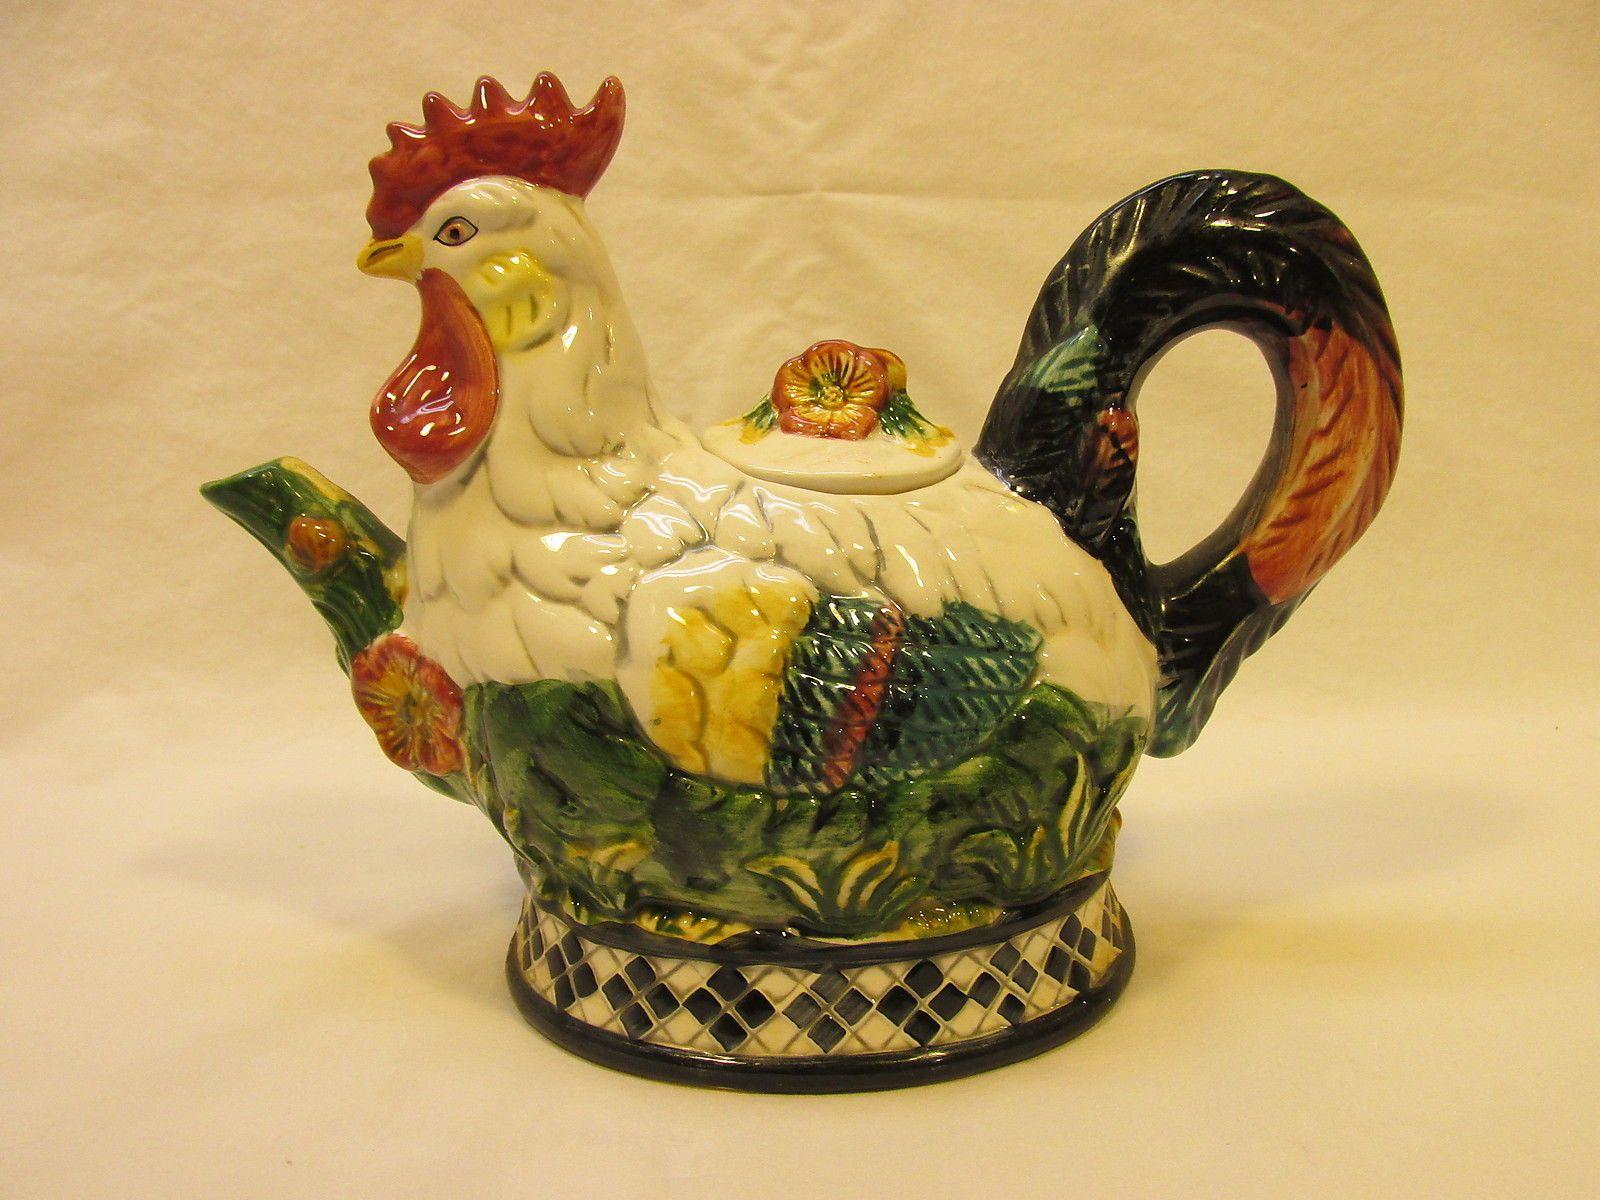 Collector Porcelain Chicken Rooster TEA POT CBX 1998 | eBay